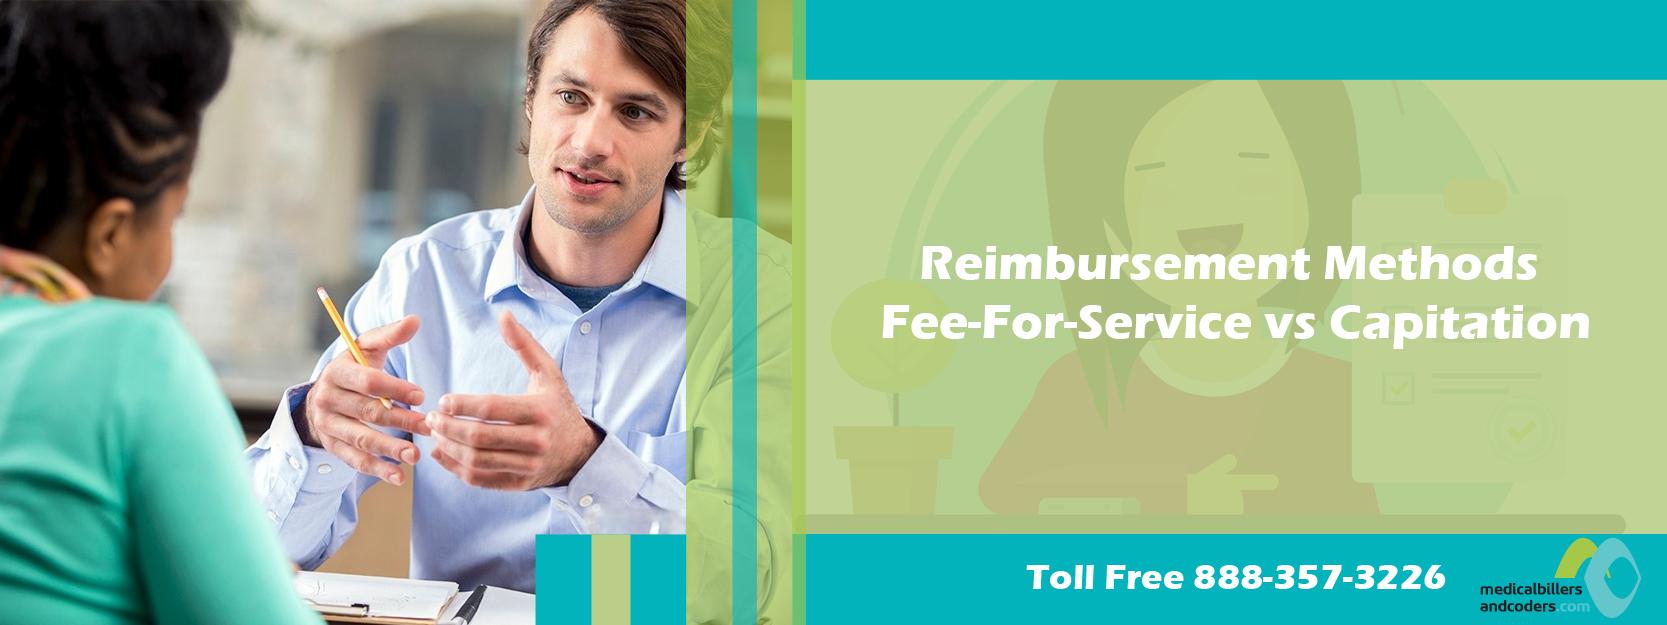 reimbursement-methods-fee-for-service-vs-capitation